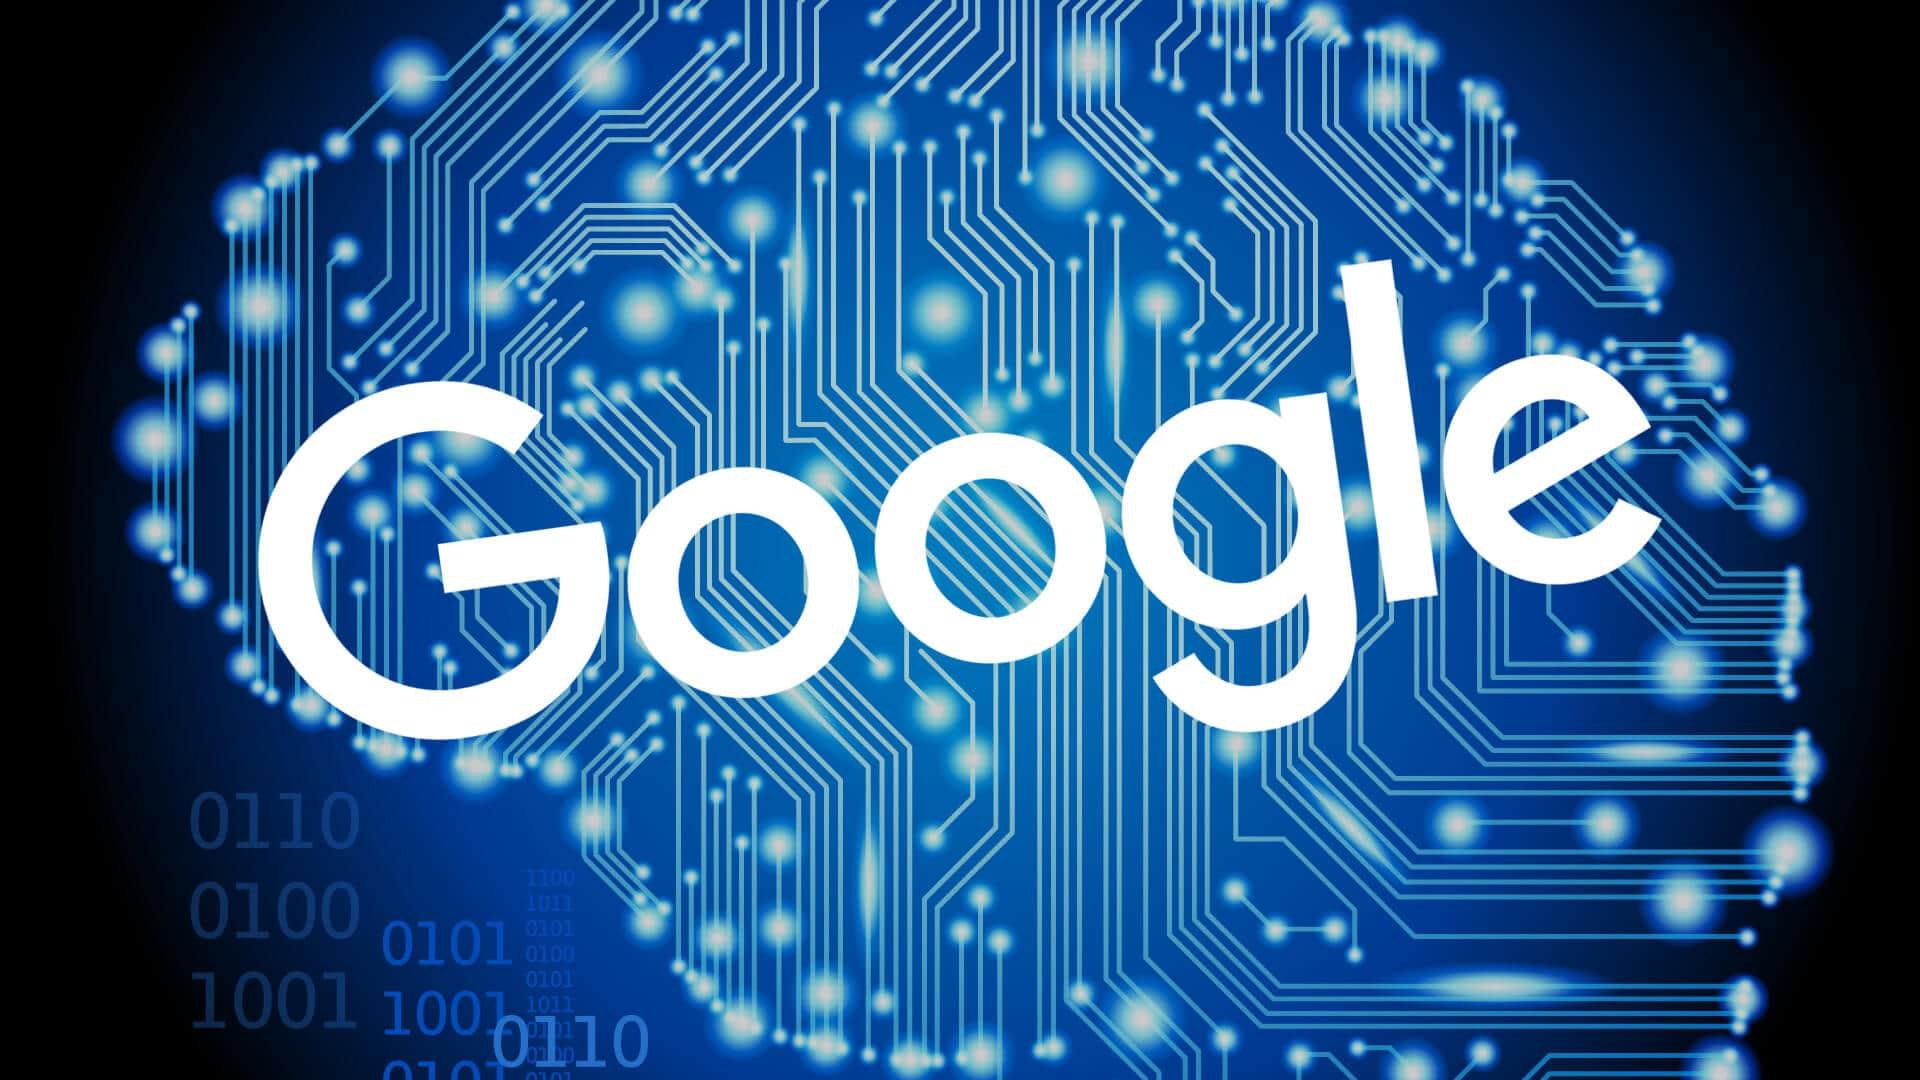 Google Rankbrain SEO trends 2019